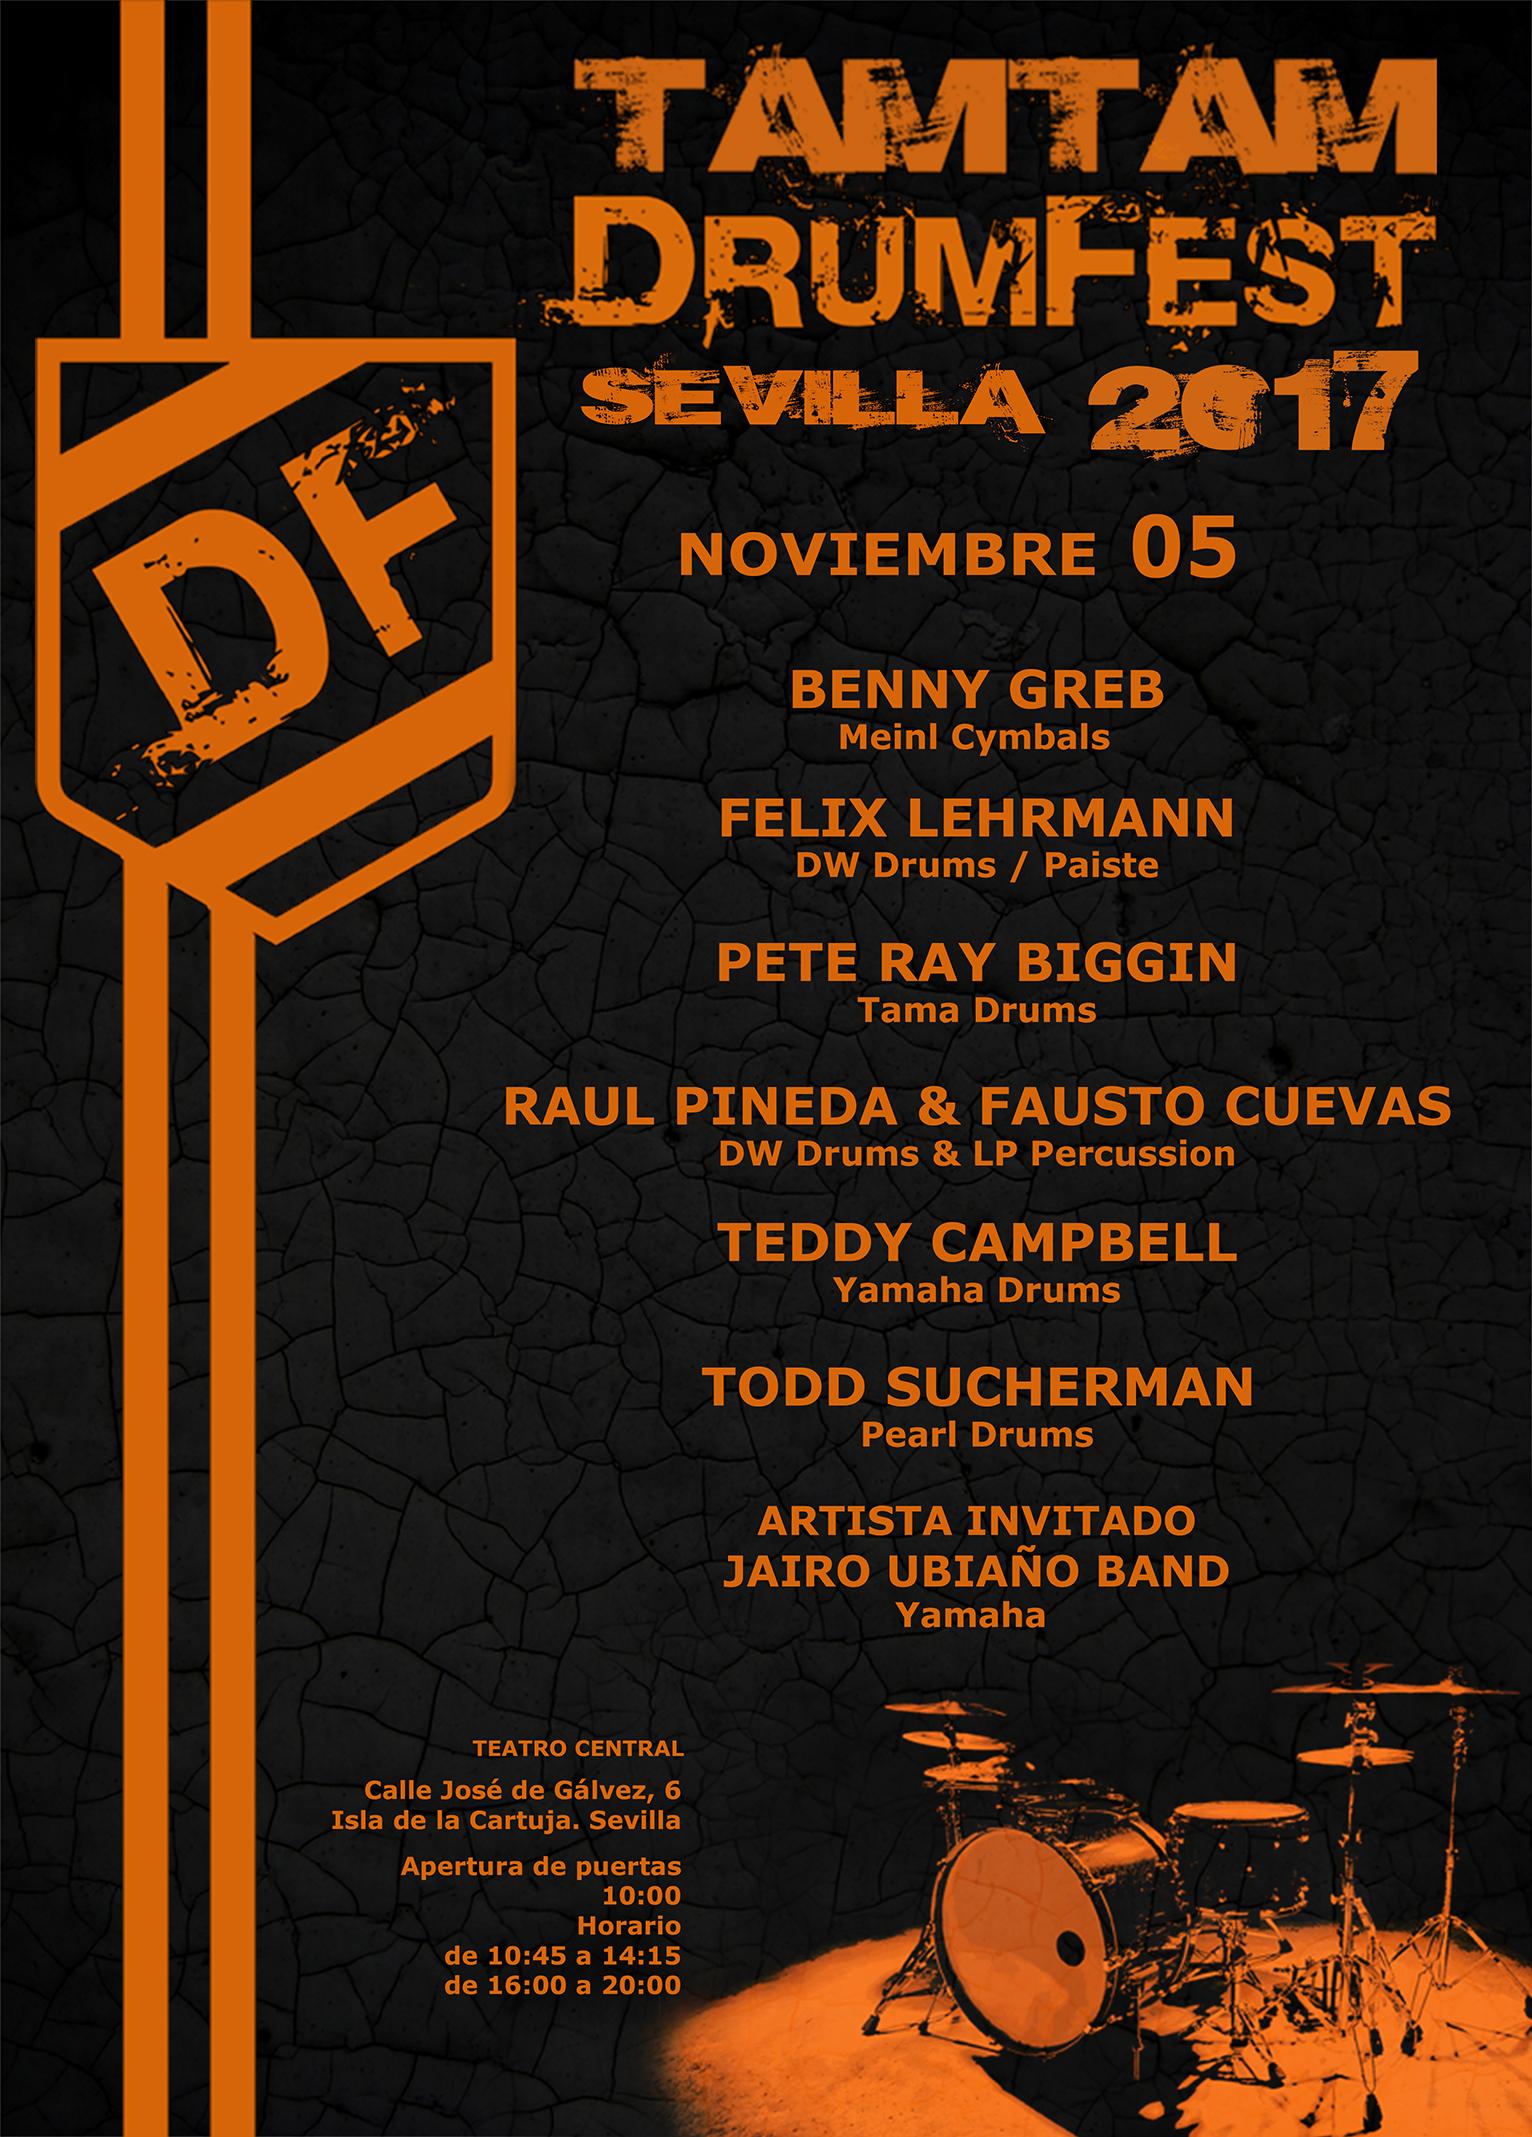 TamTam DrumFest Sevilla 2017